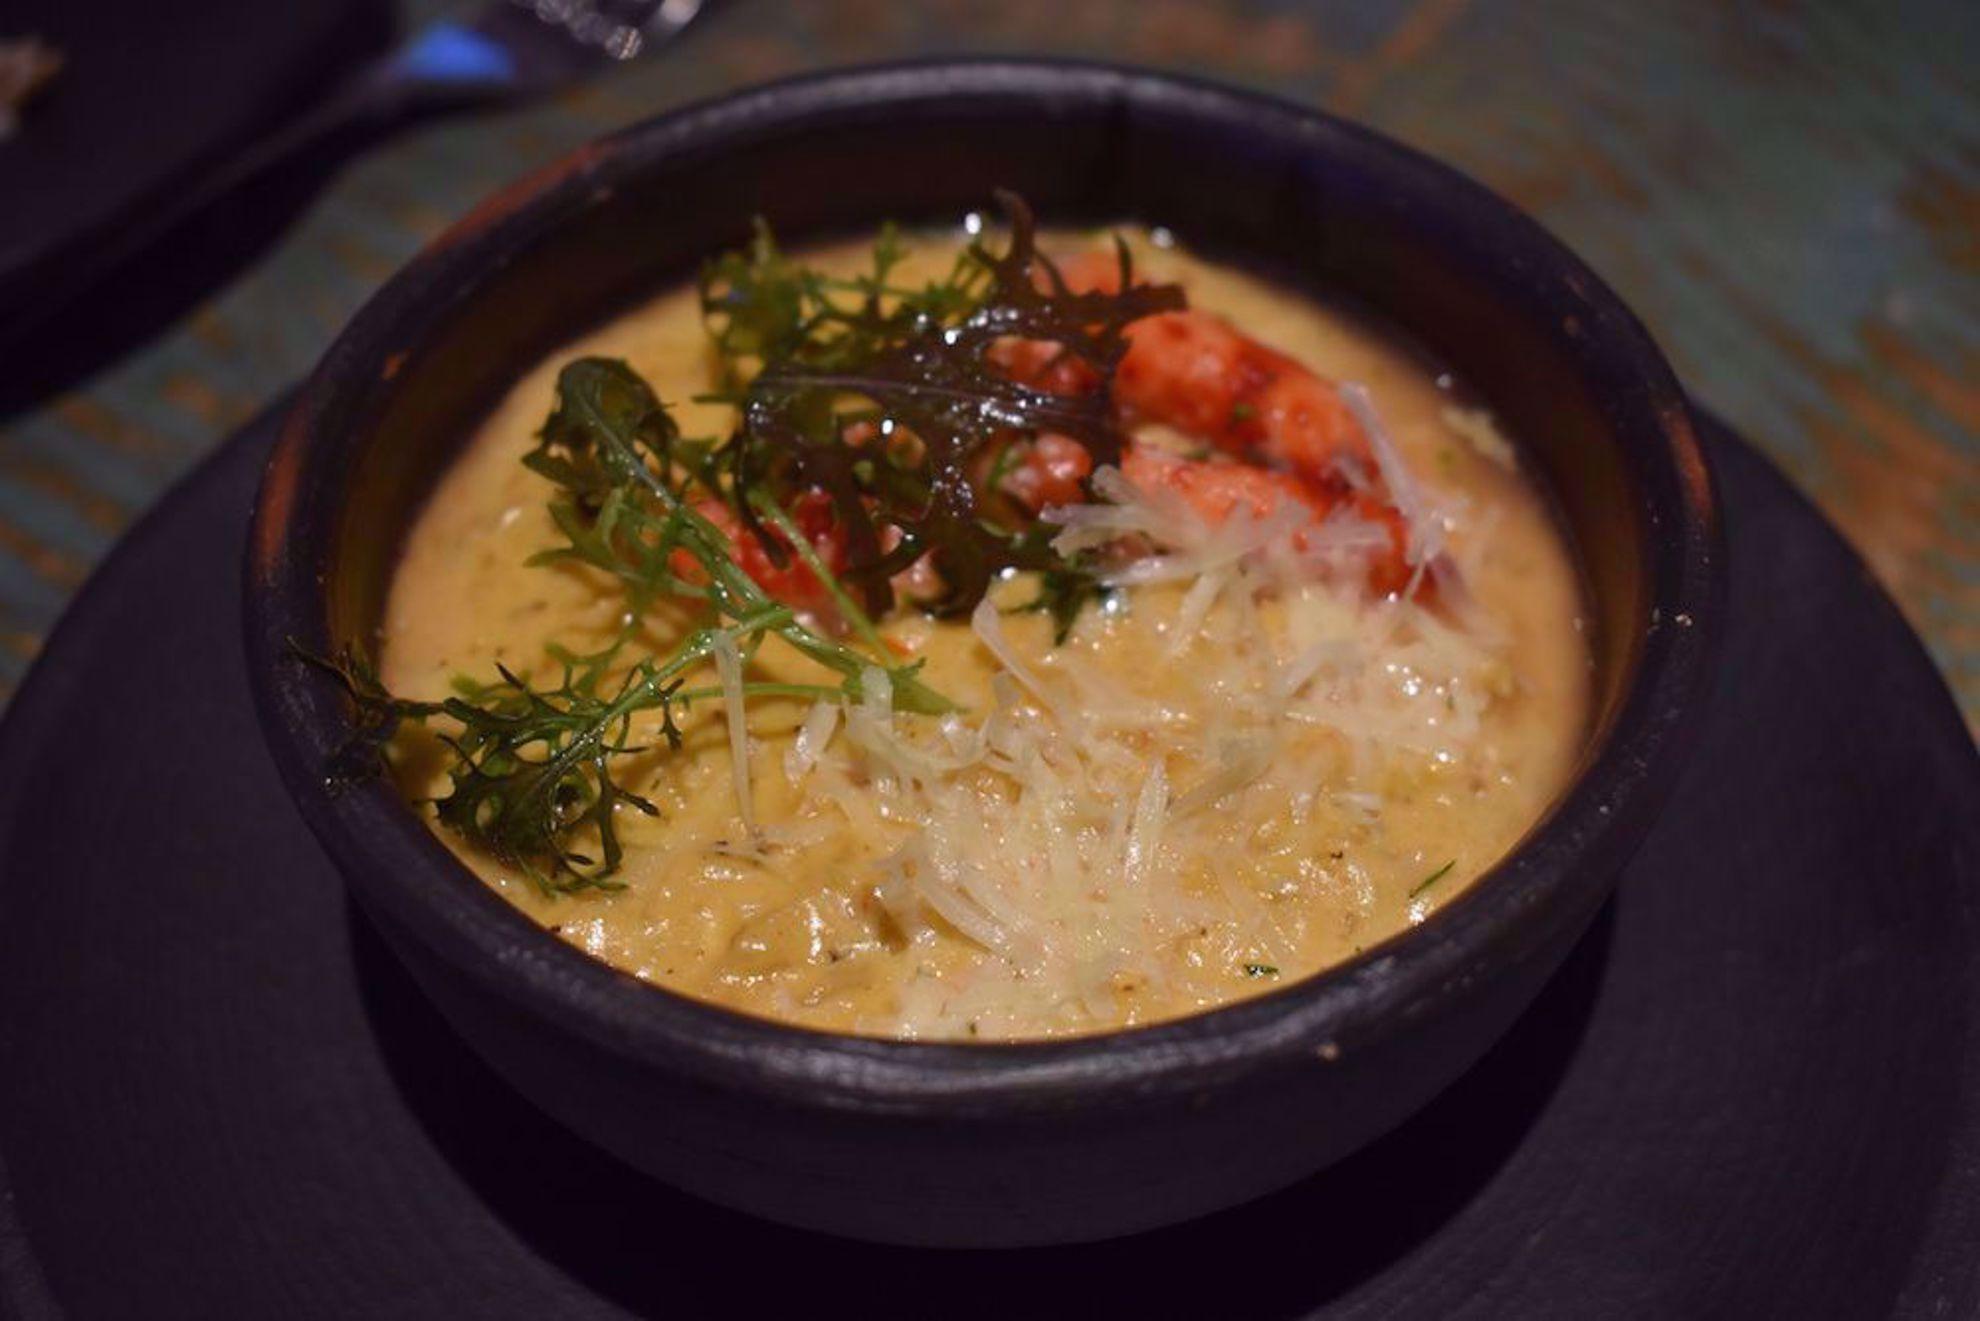 Seafood stew at Parque Futangue resort